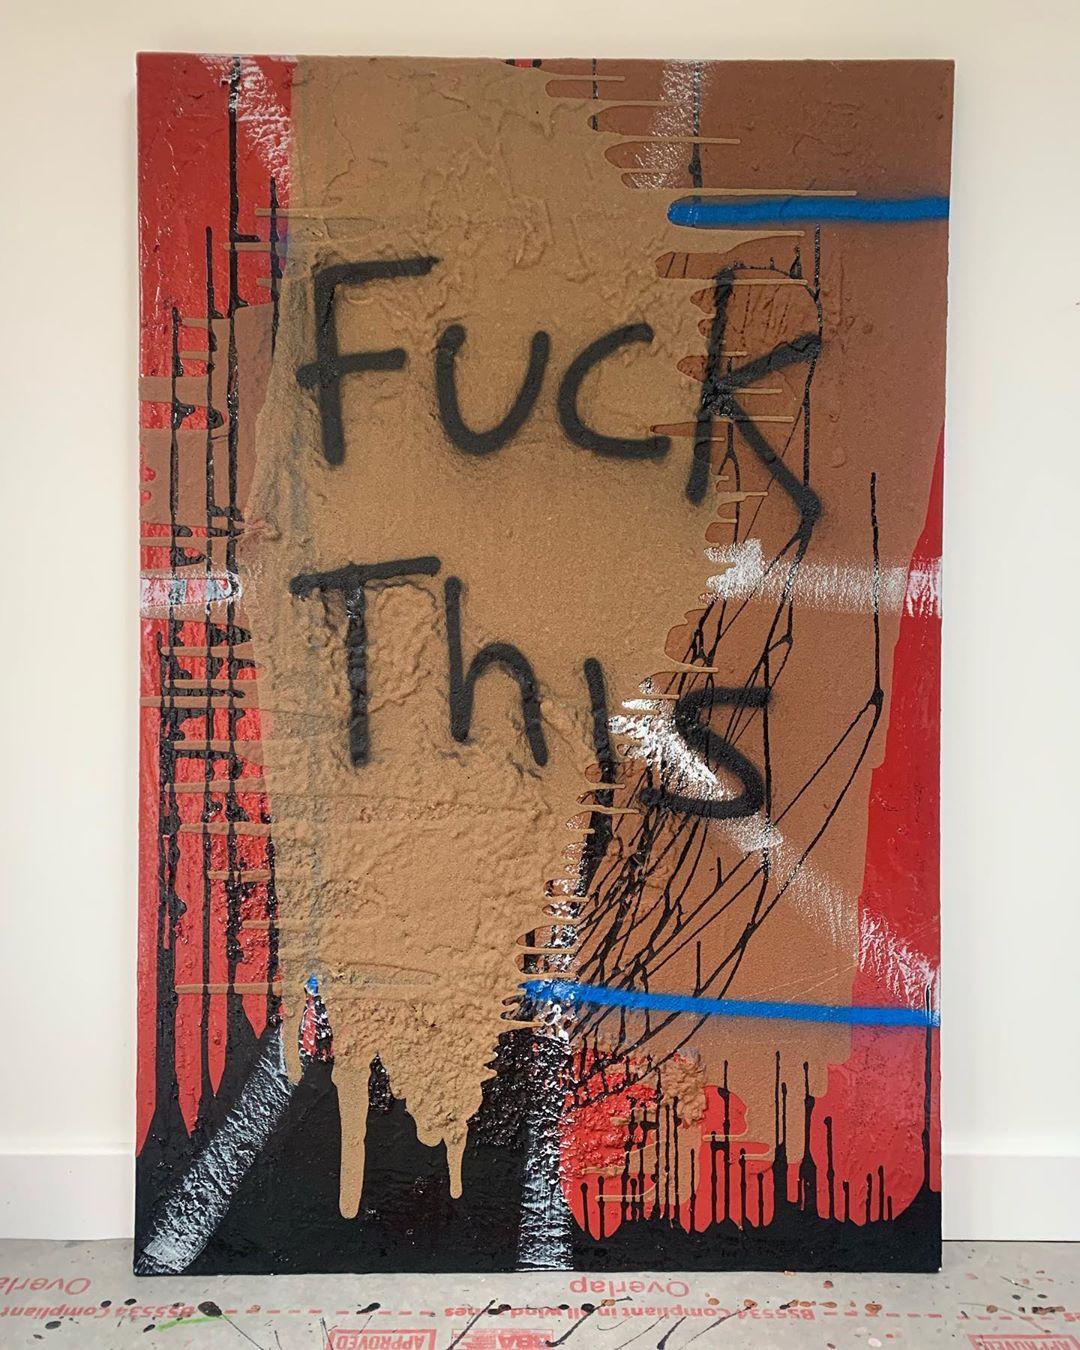 Louis Slater Art 1